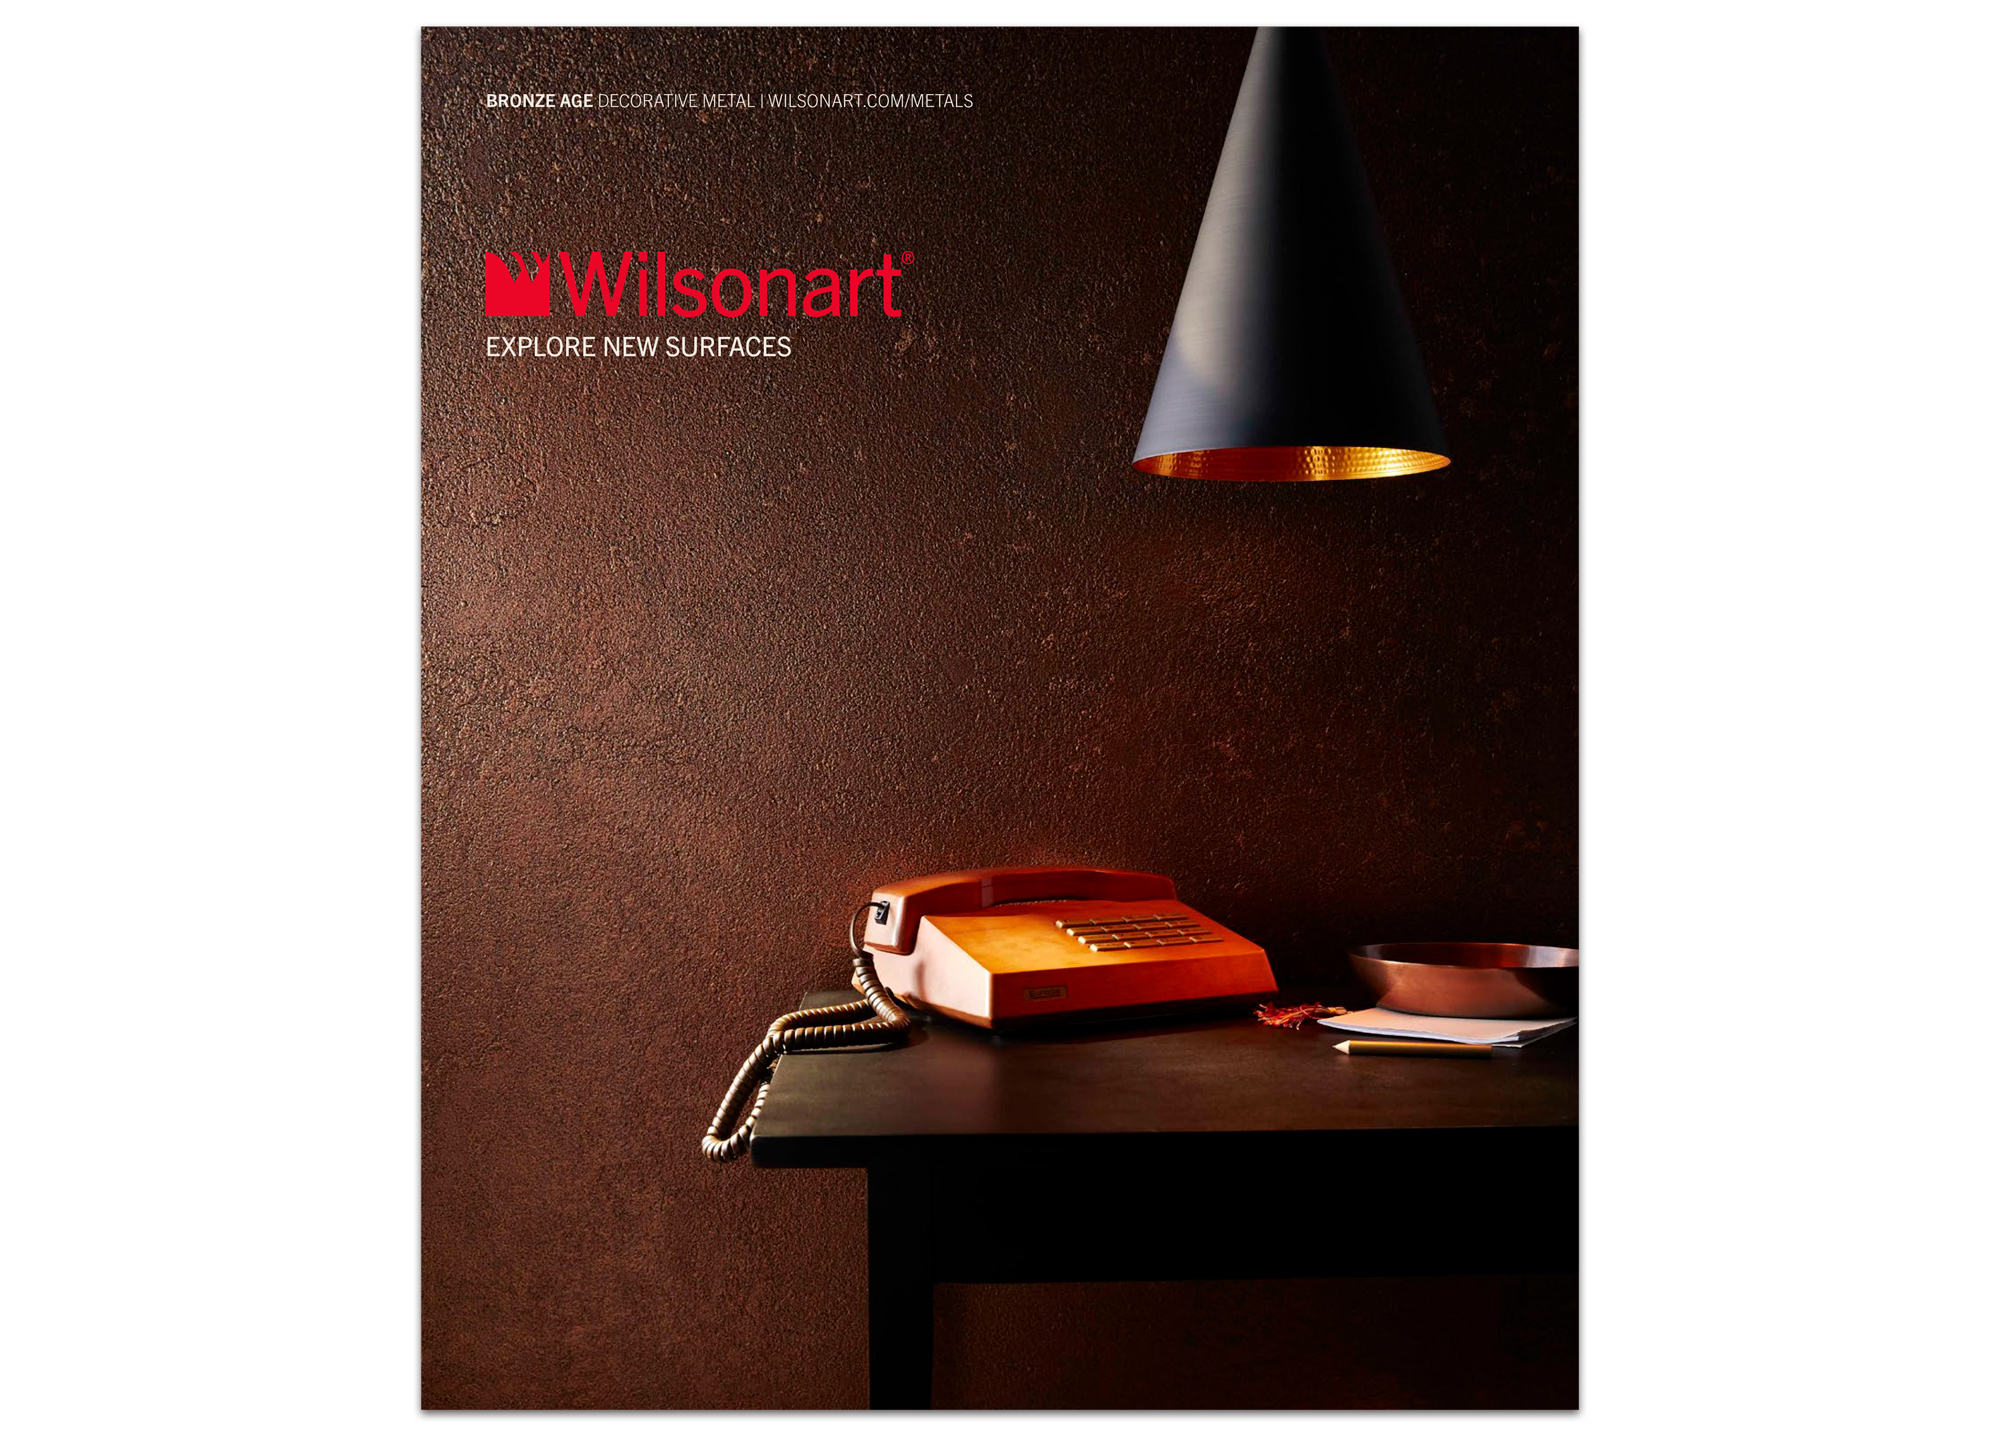 WA-Advertising-151224-01-Preview-6.jpg